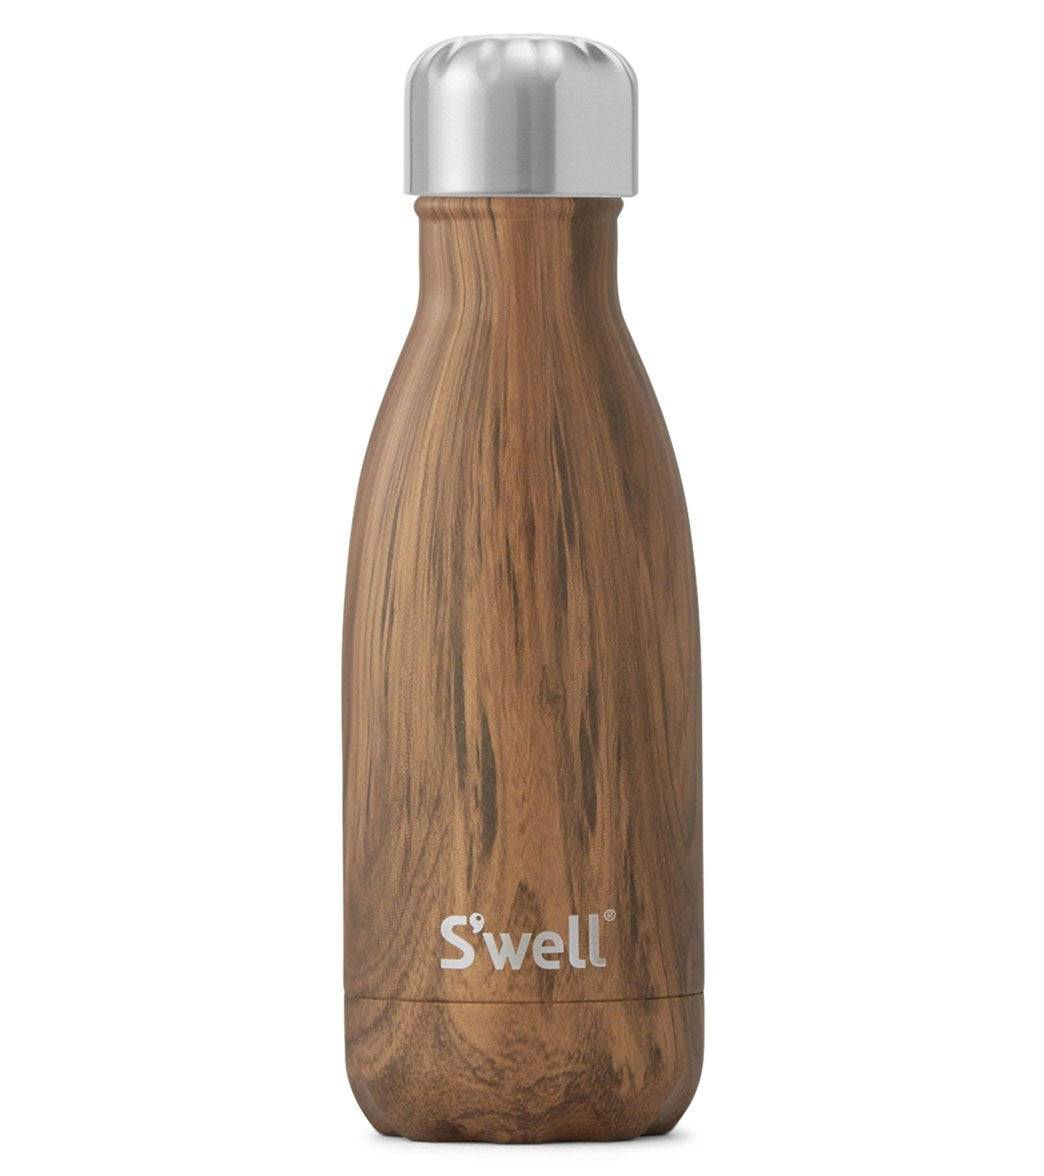 S'well 9oz Stainless Steel Water Bottle Teakwood